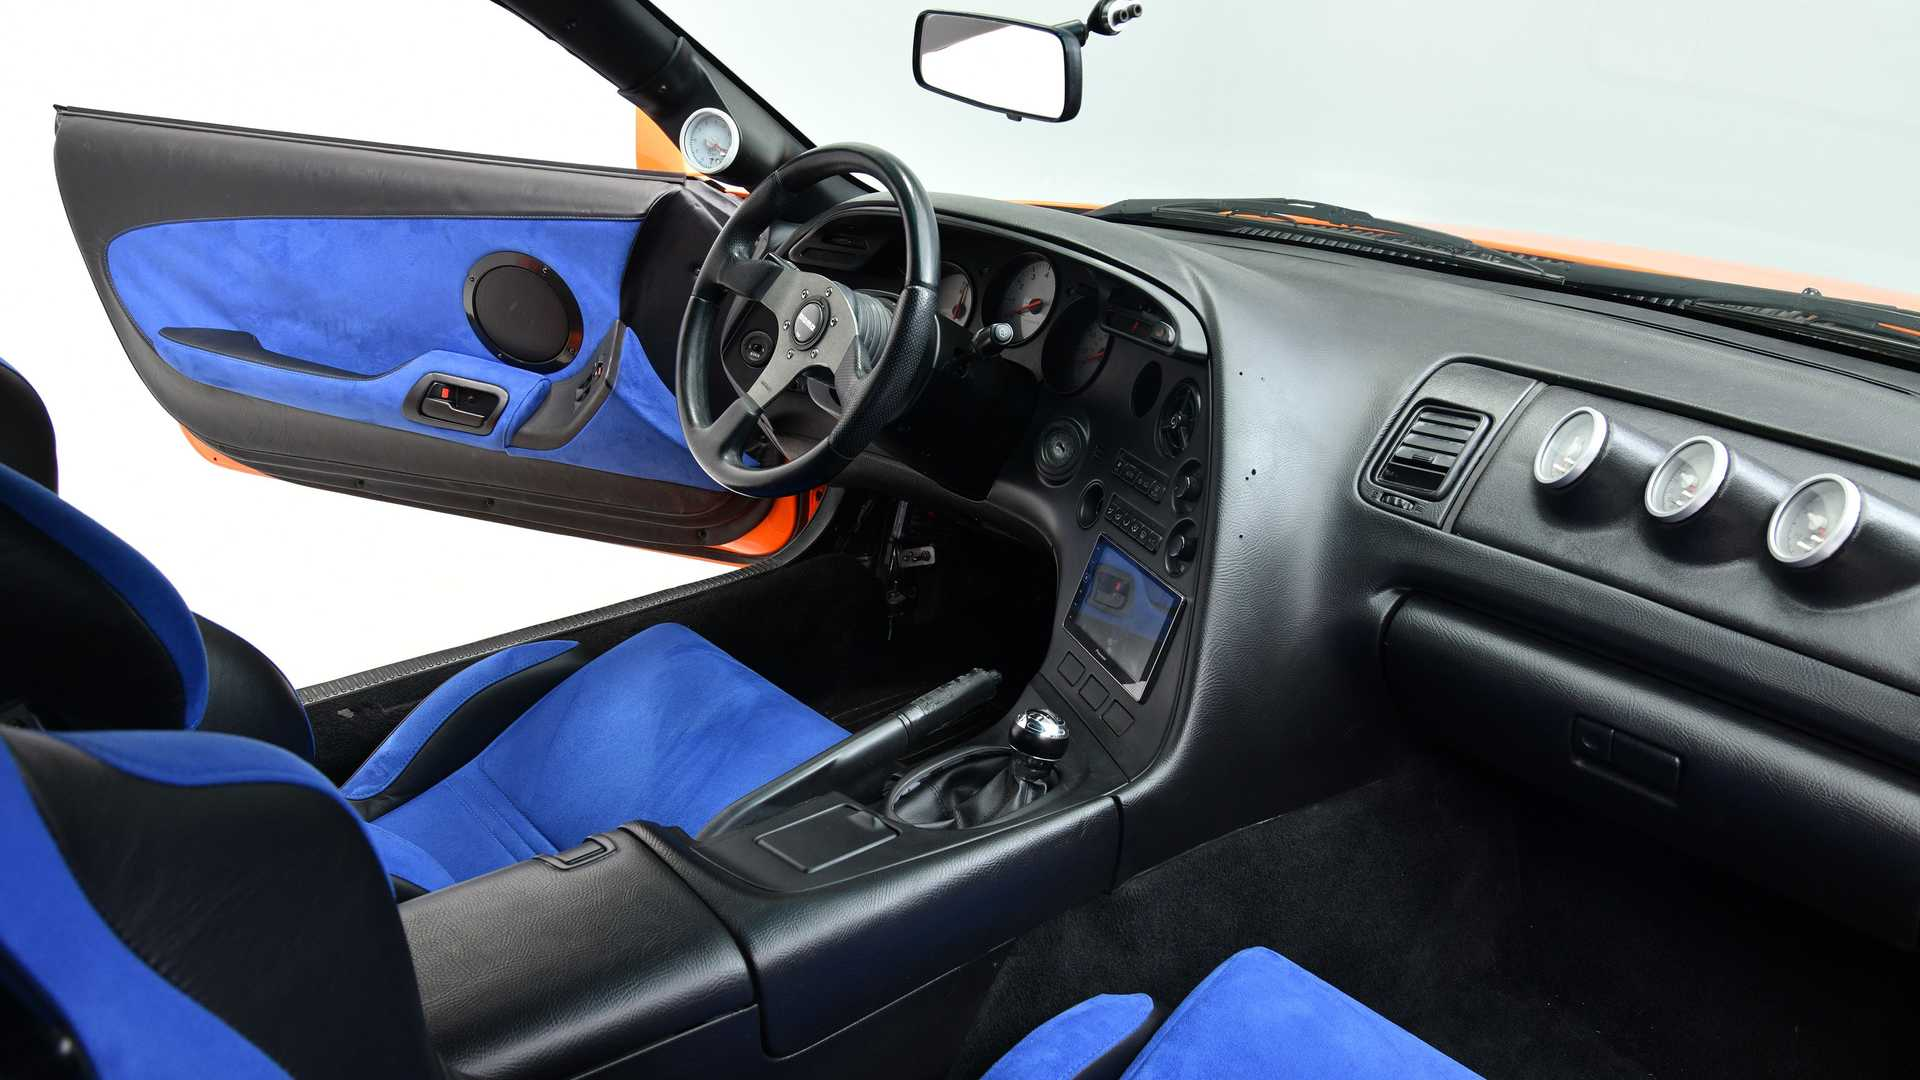 subasta Toyota Supra 'The Fast and the Furious'